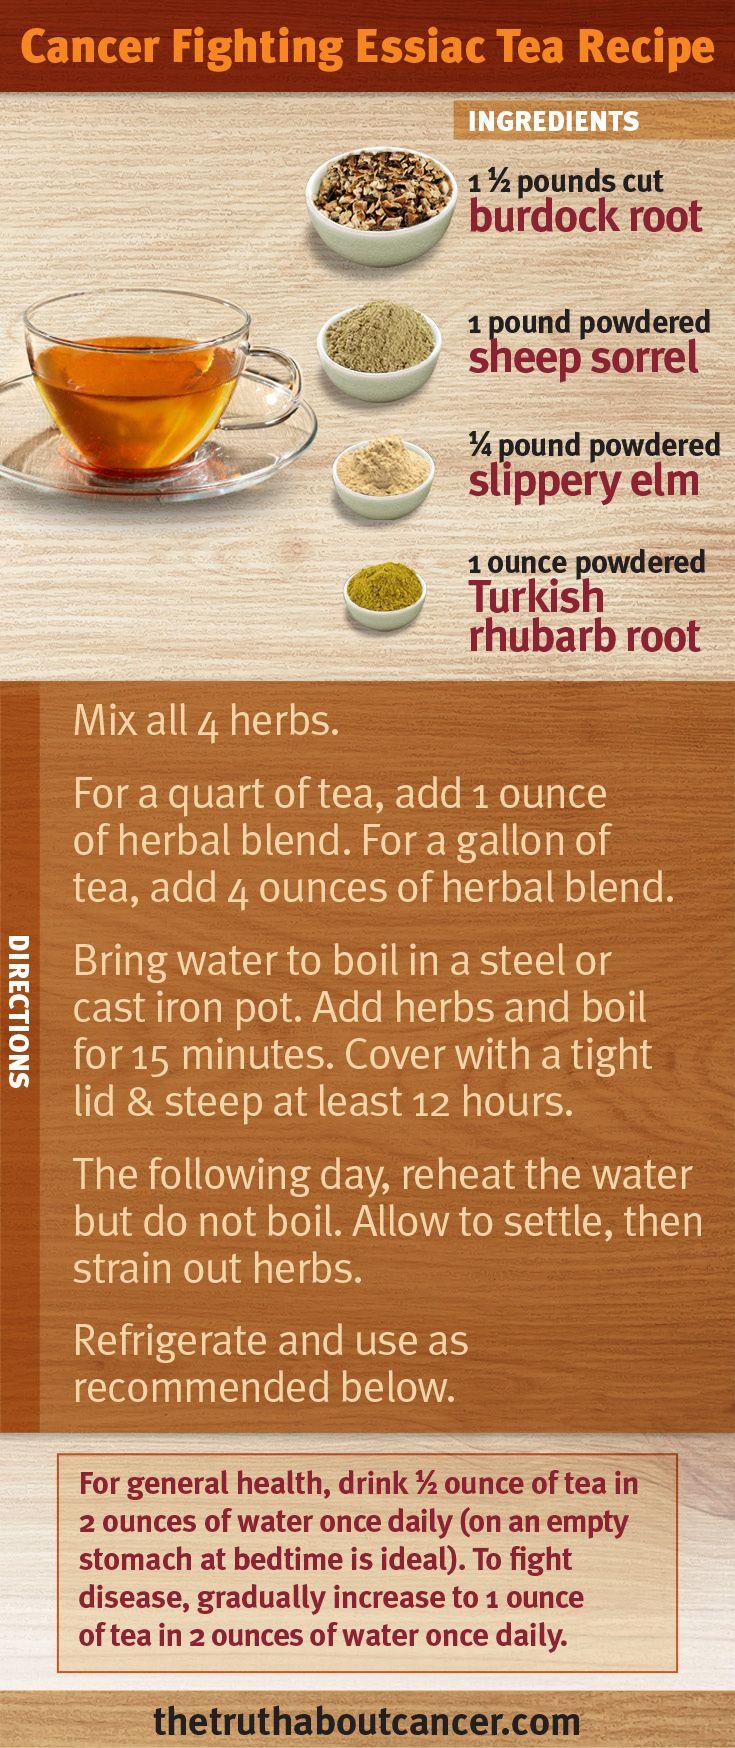 The cancer fighting essiac tea recipe